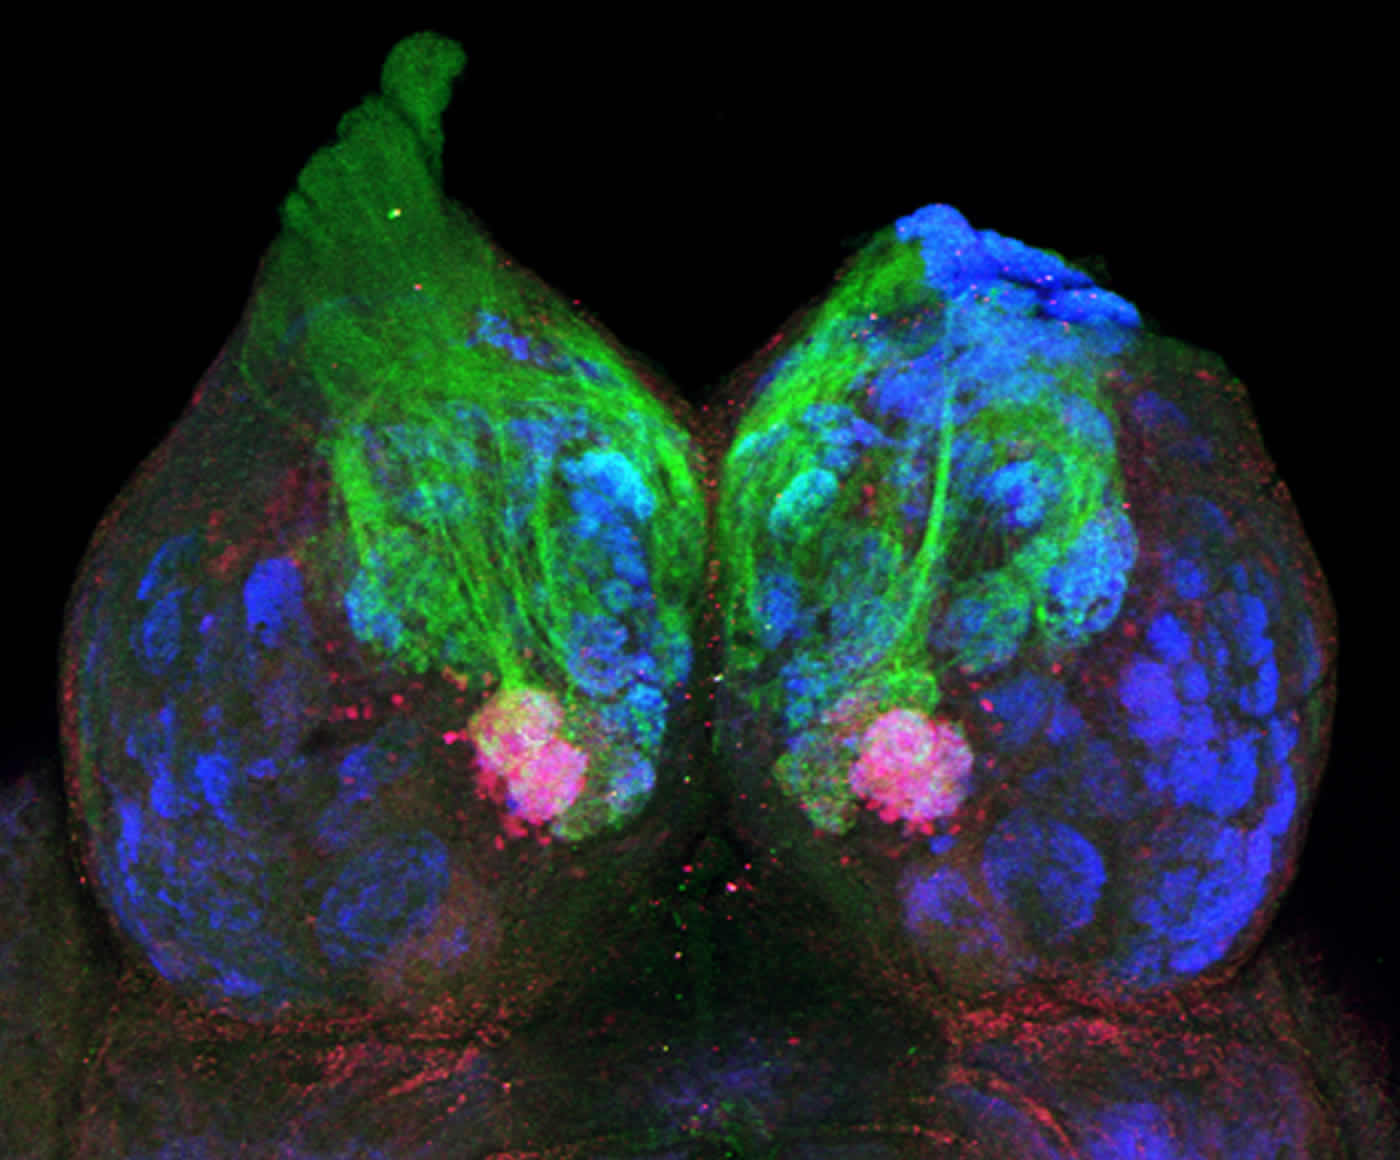 Image shows a zebrafish olfactory bulb.